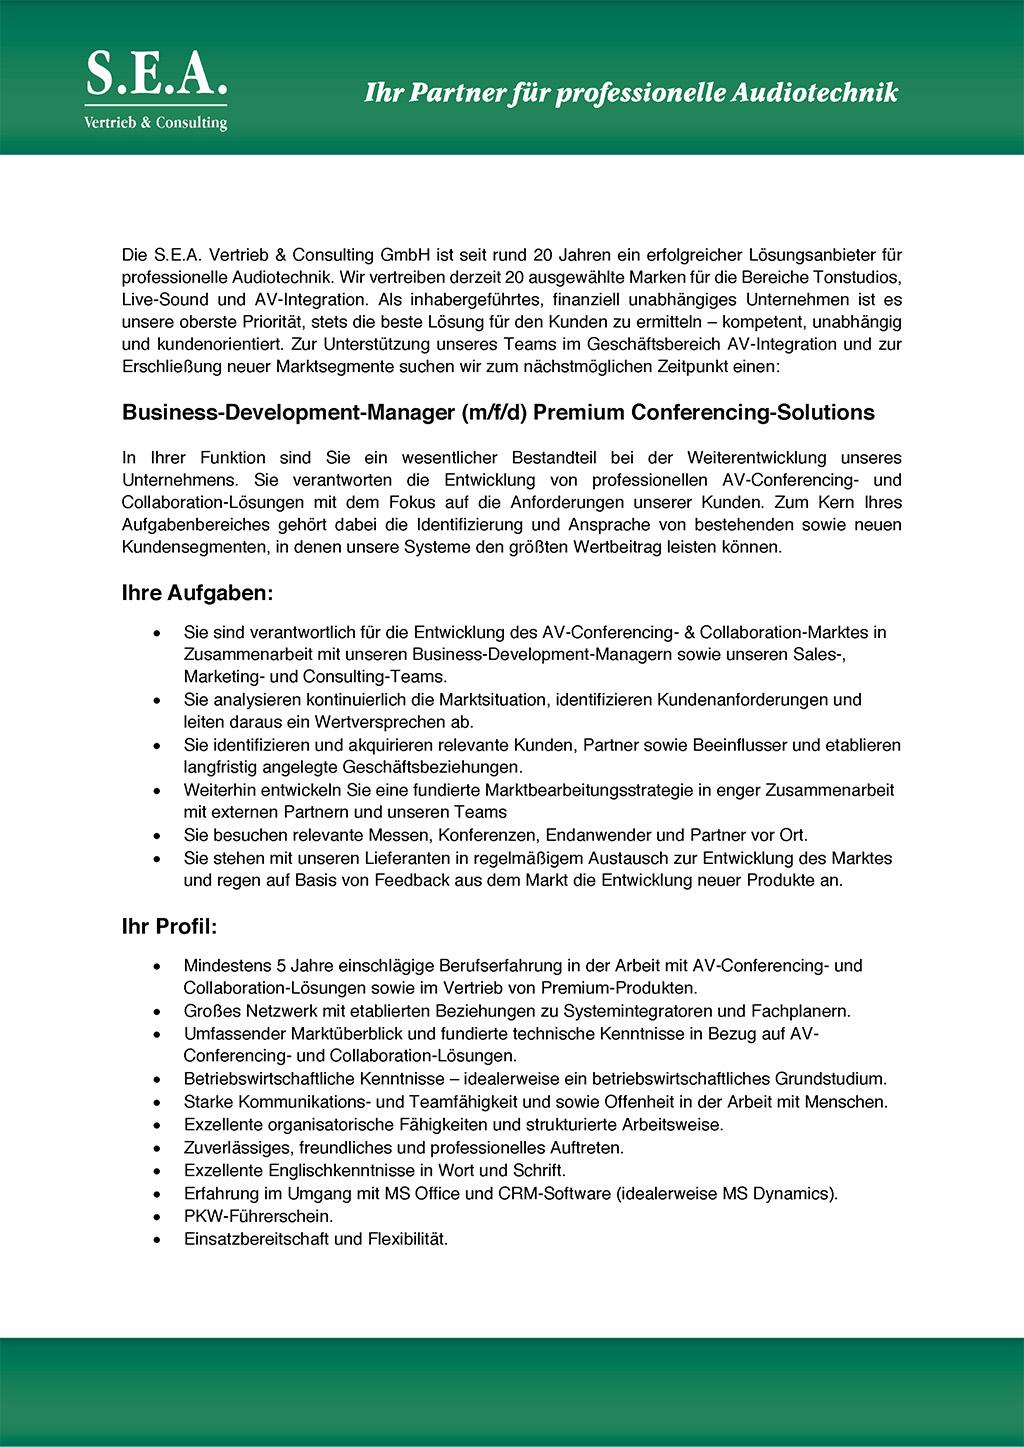 Stellenanzeige SEA BDM Conferencing